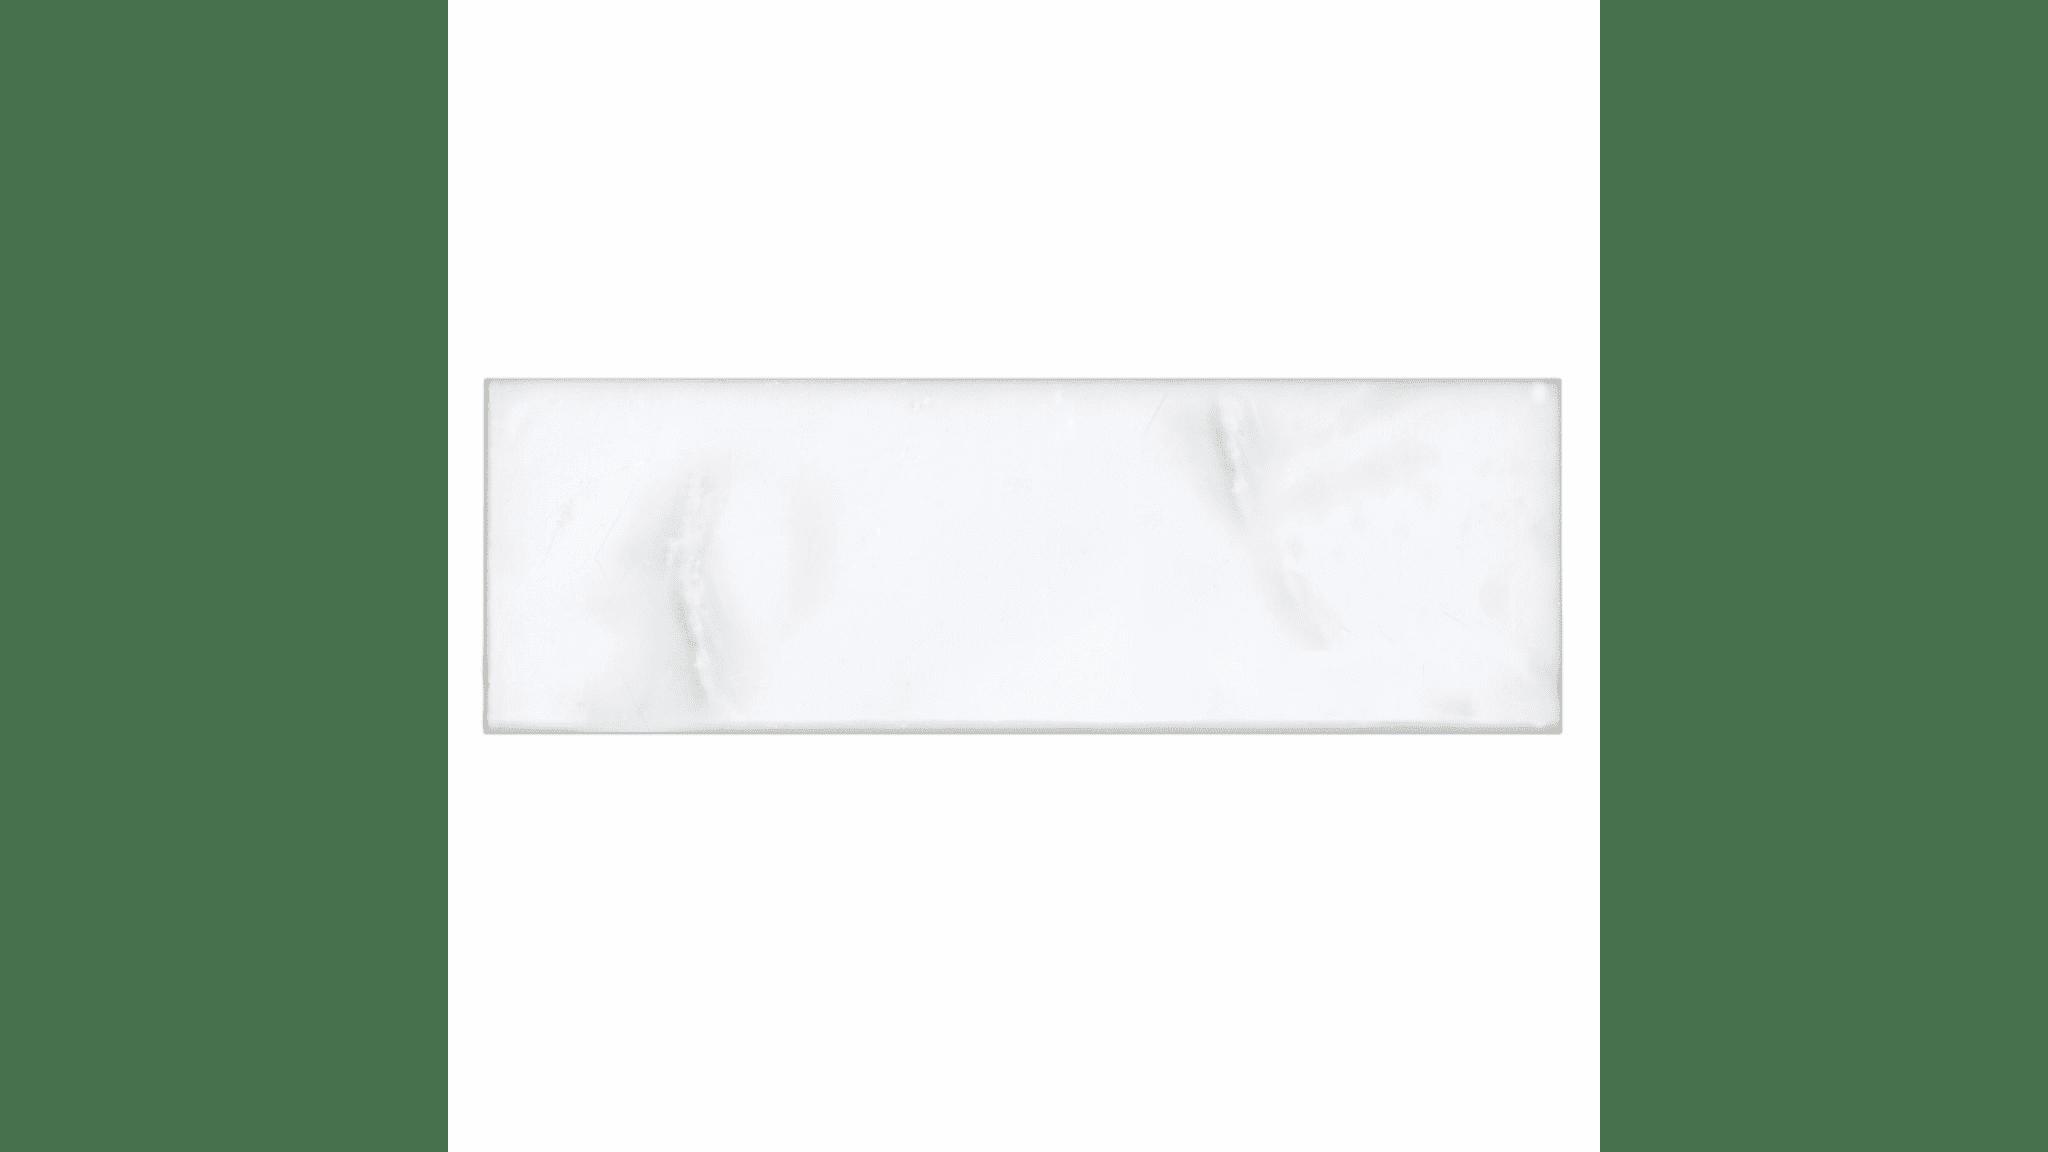 Hampton Carrara Polished Marble Subway Tile 4x12 In Luxury